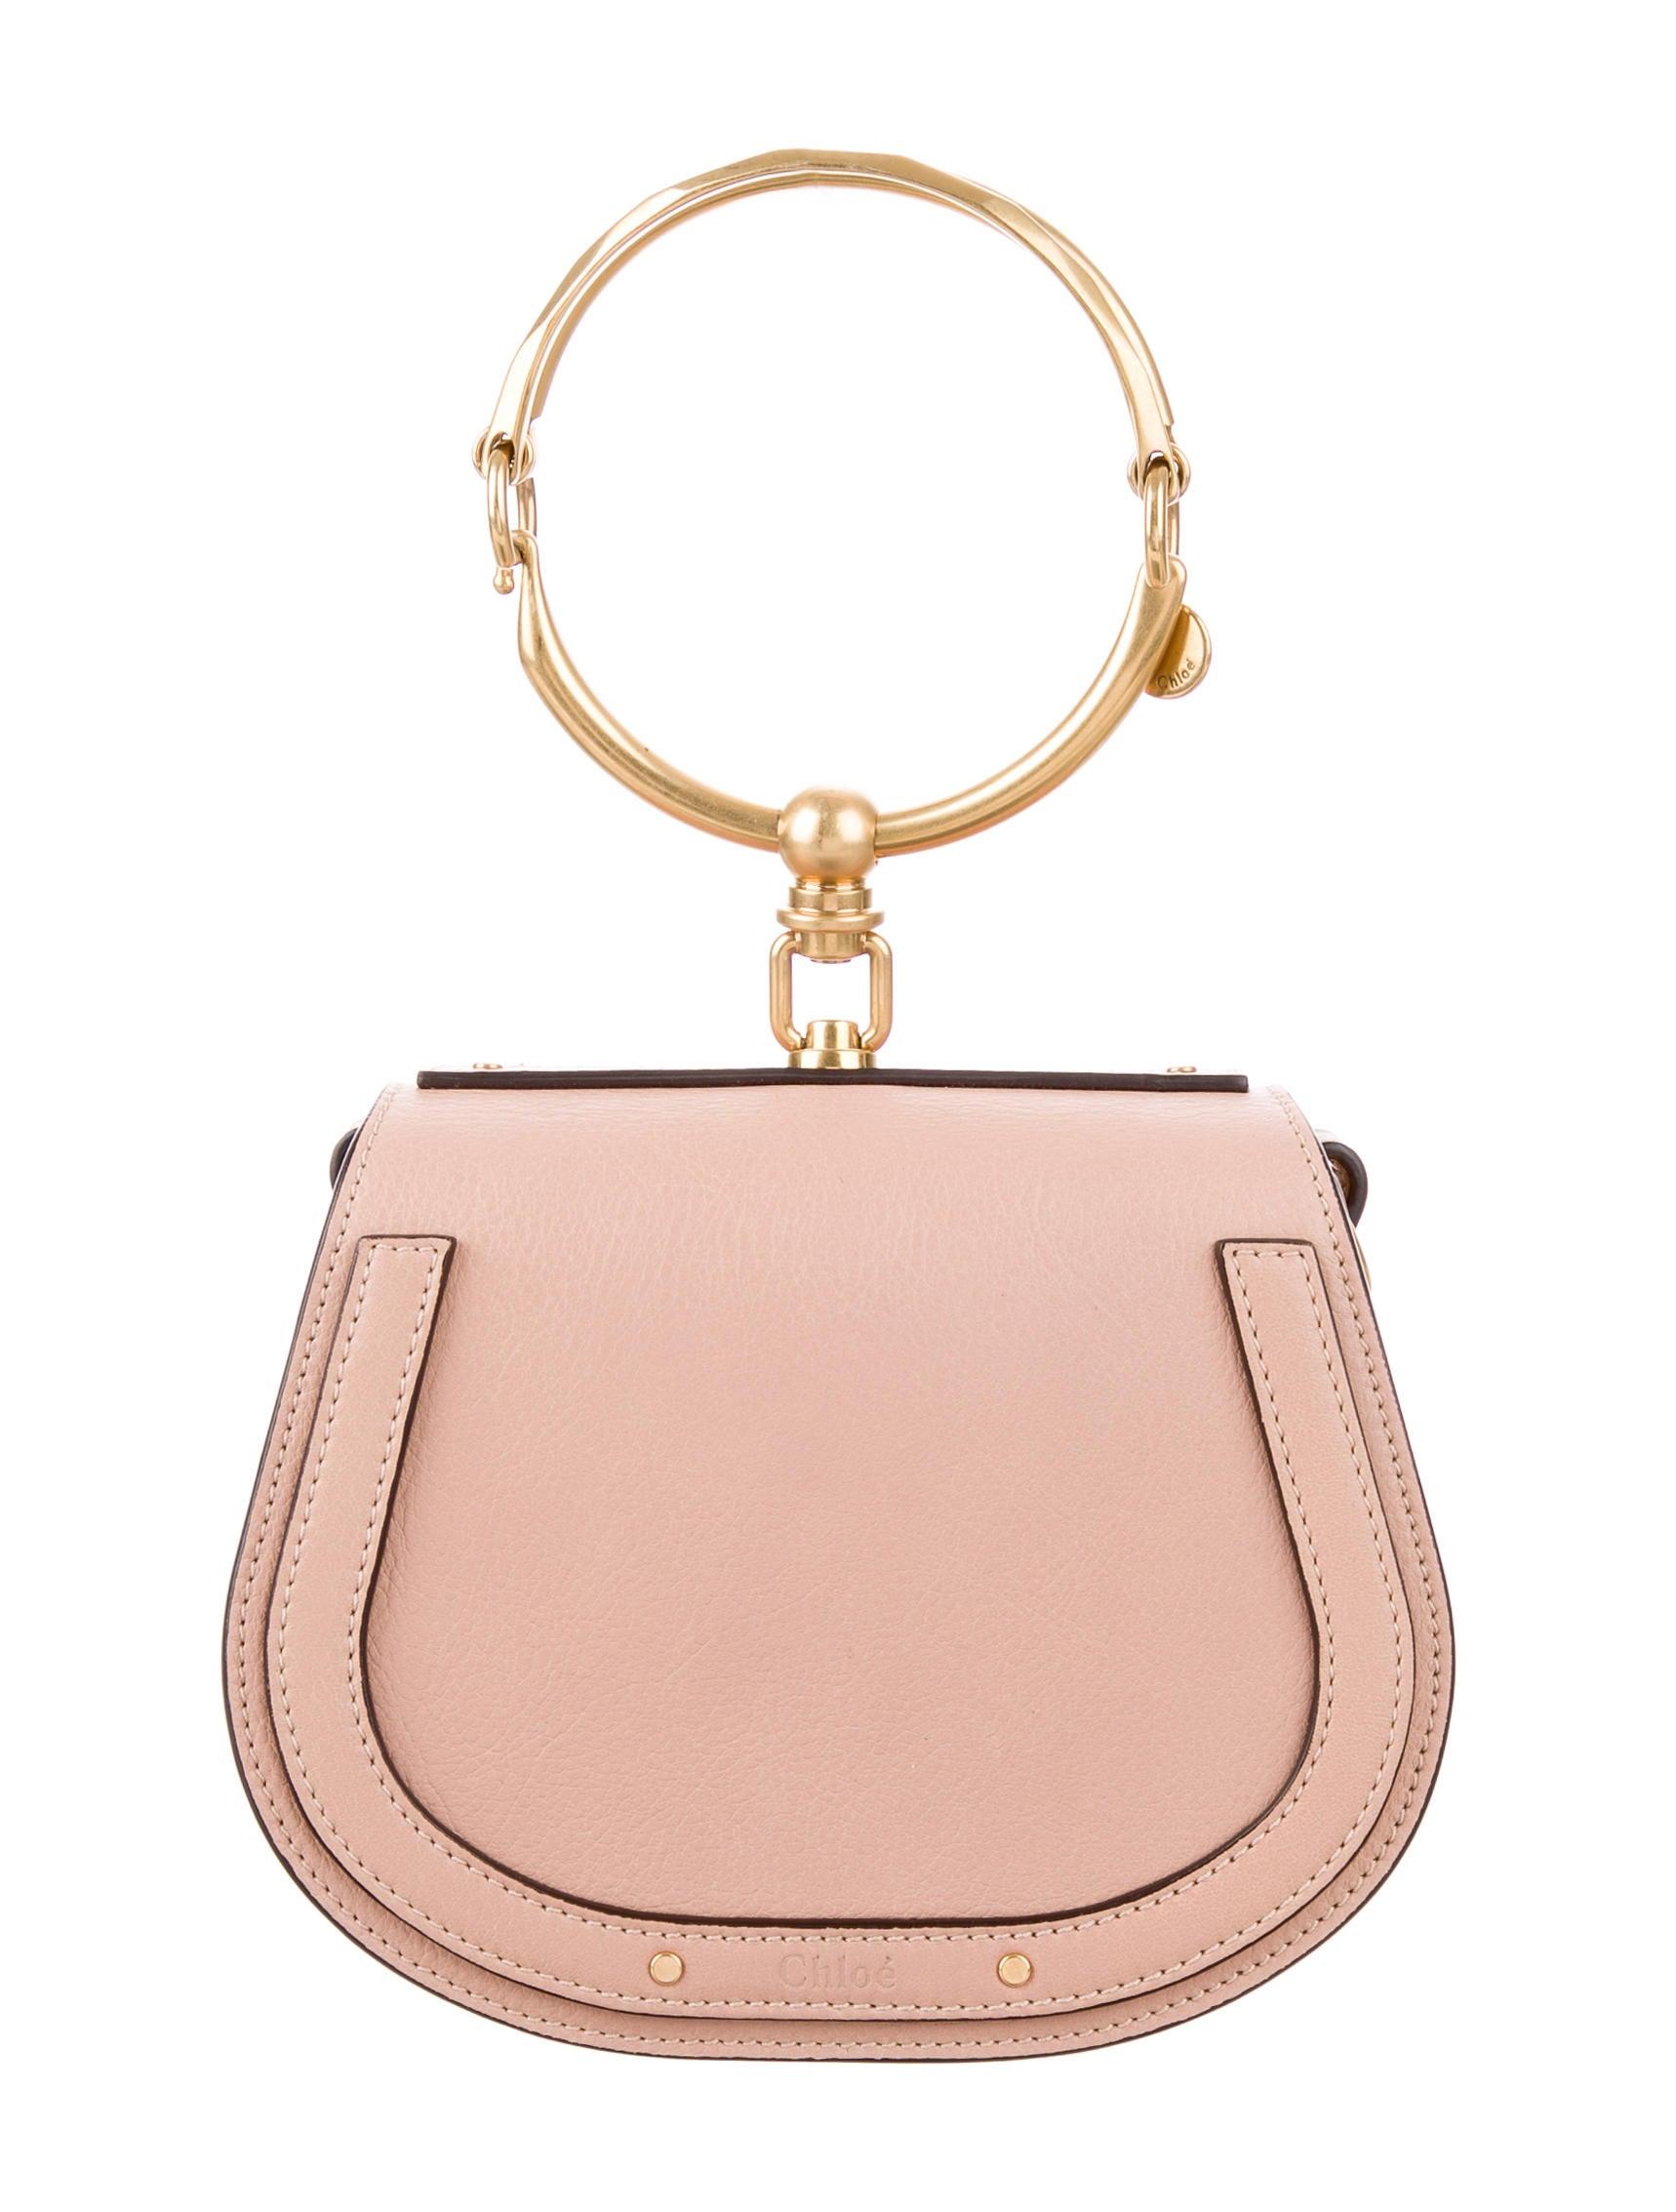 c94b77c7787 Chloe Nile Bracelet Bag Beige